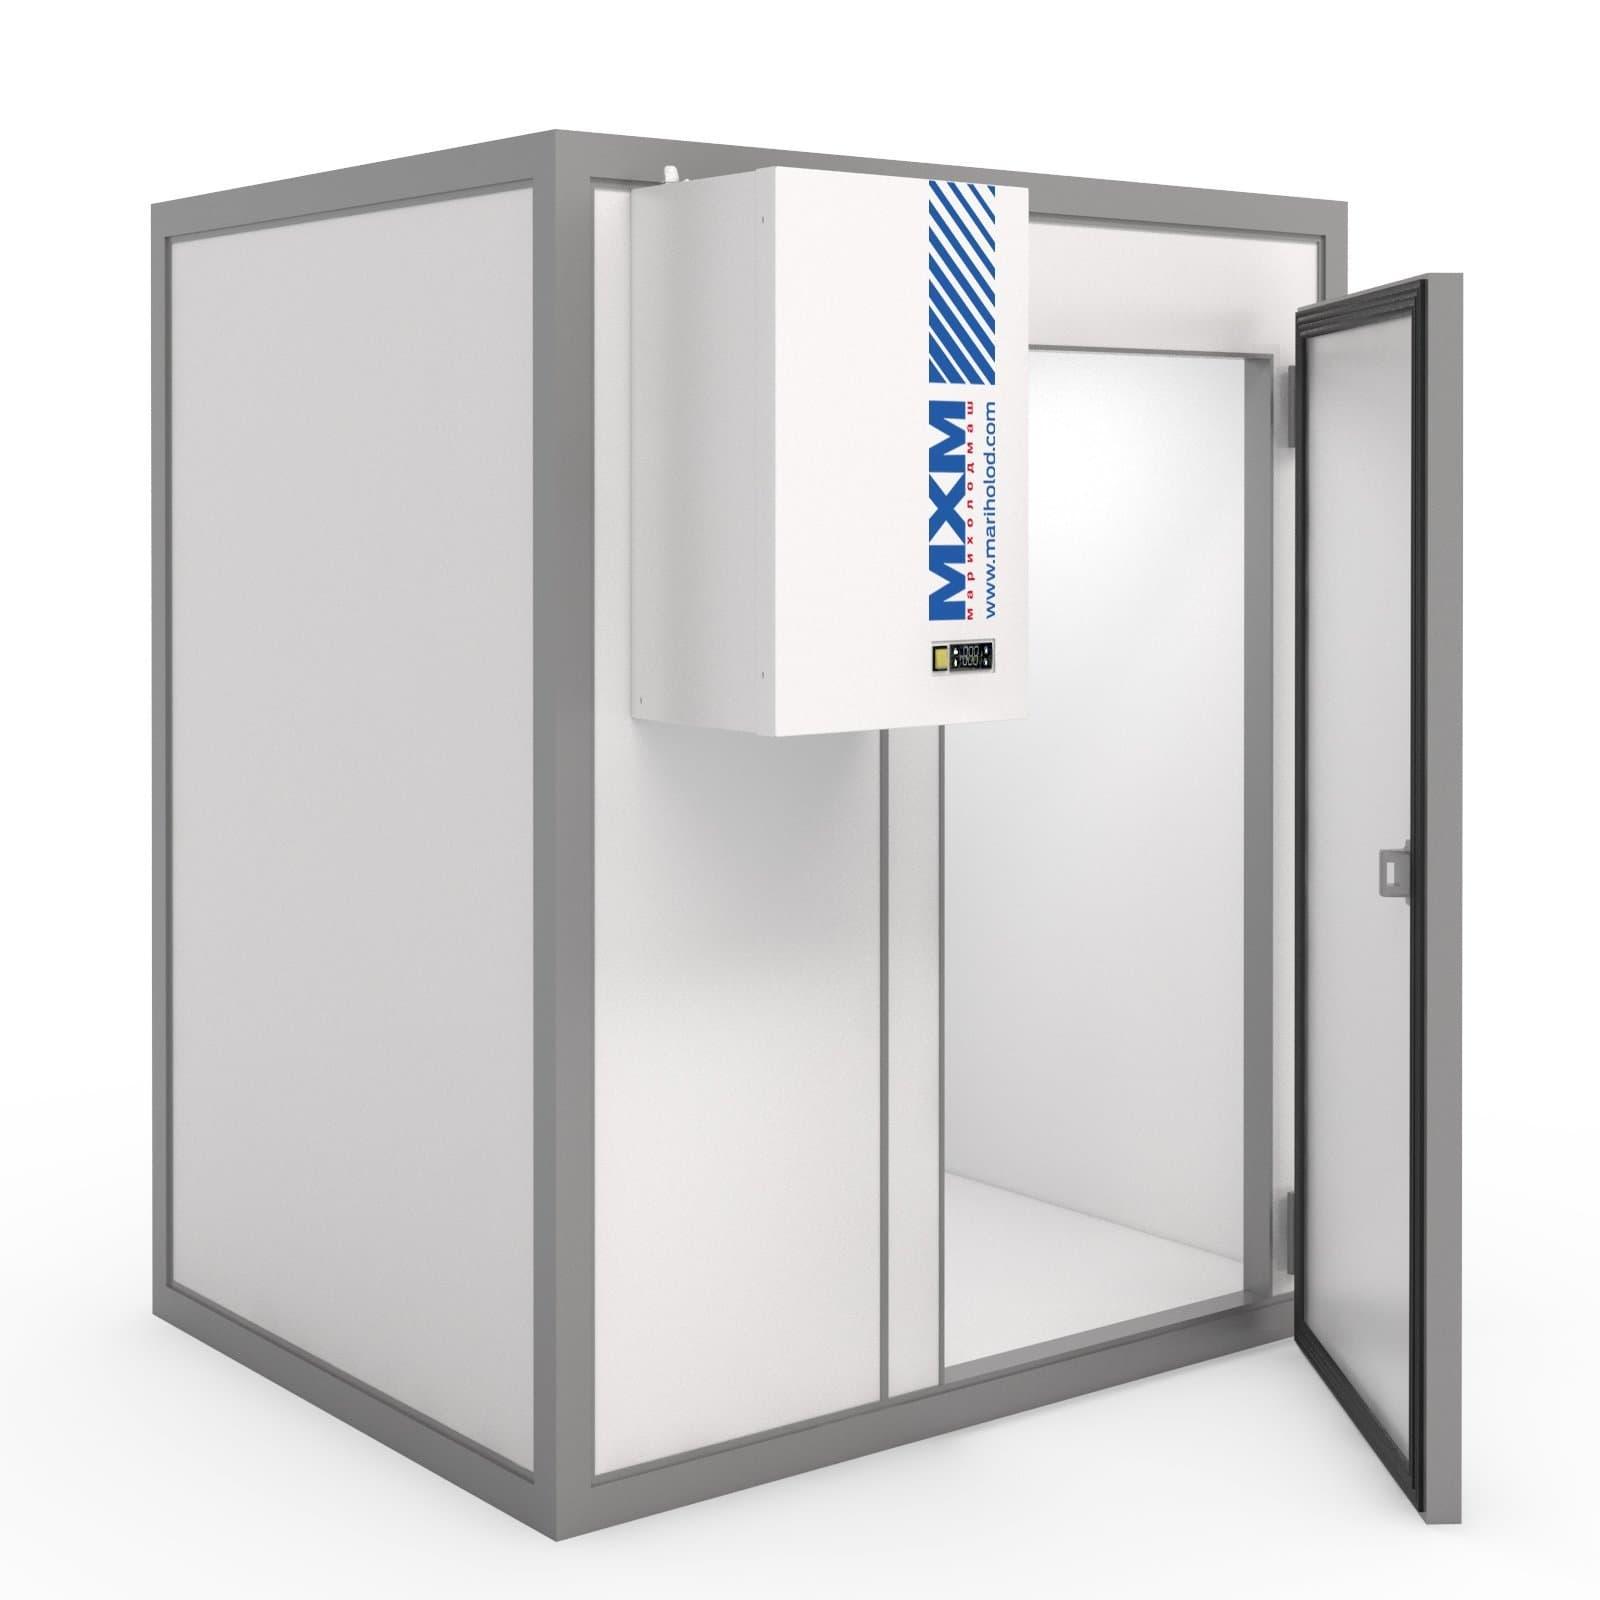 Камера холодильная КХН-35,02 (2560×5860×2720 мм)